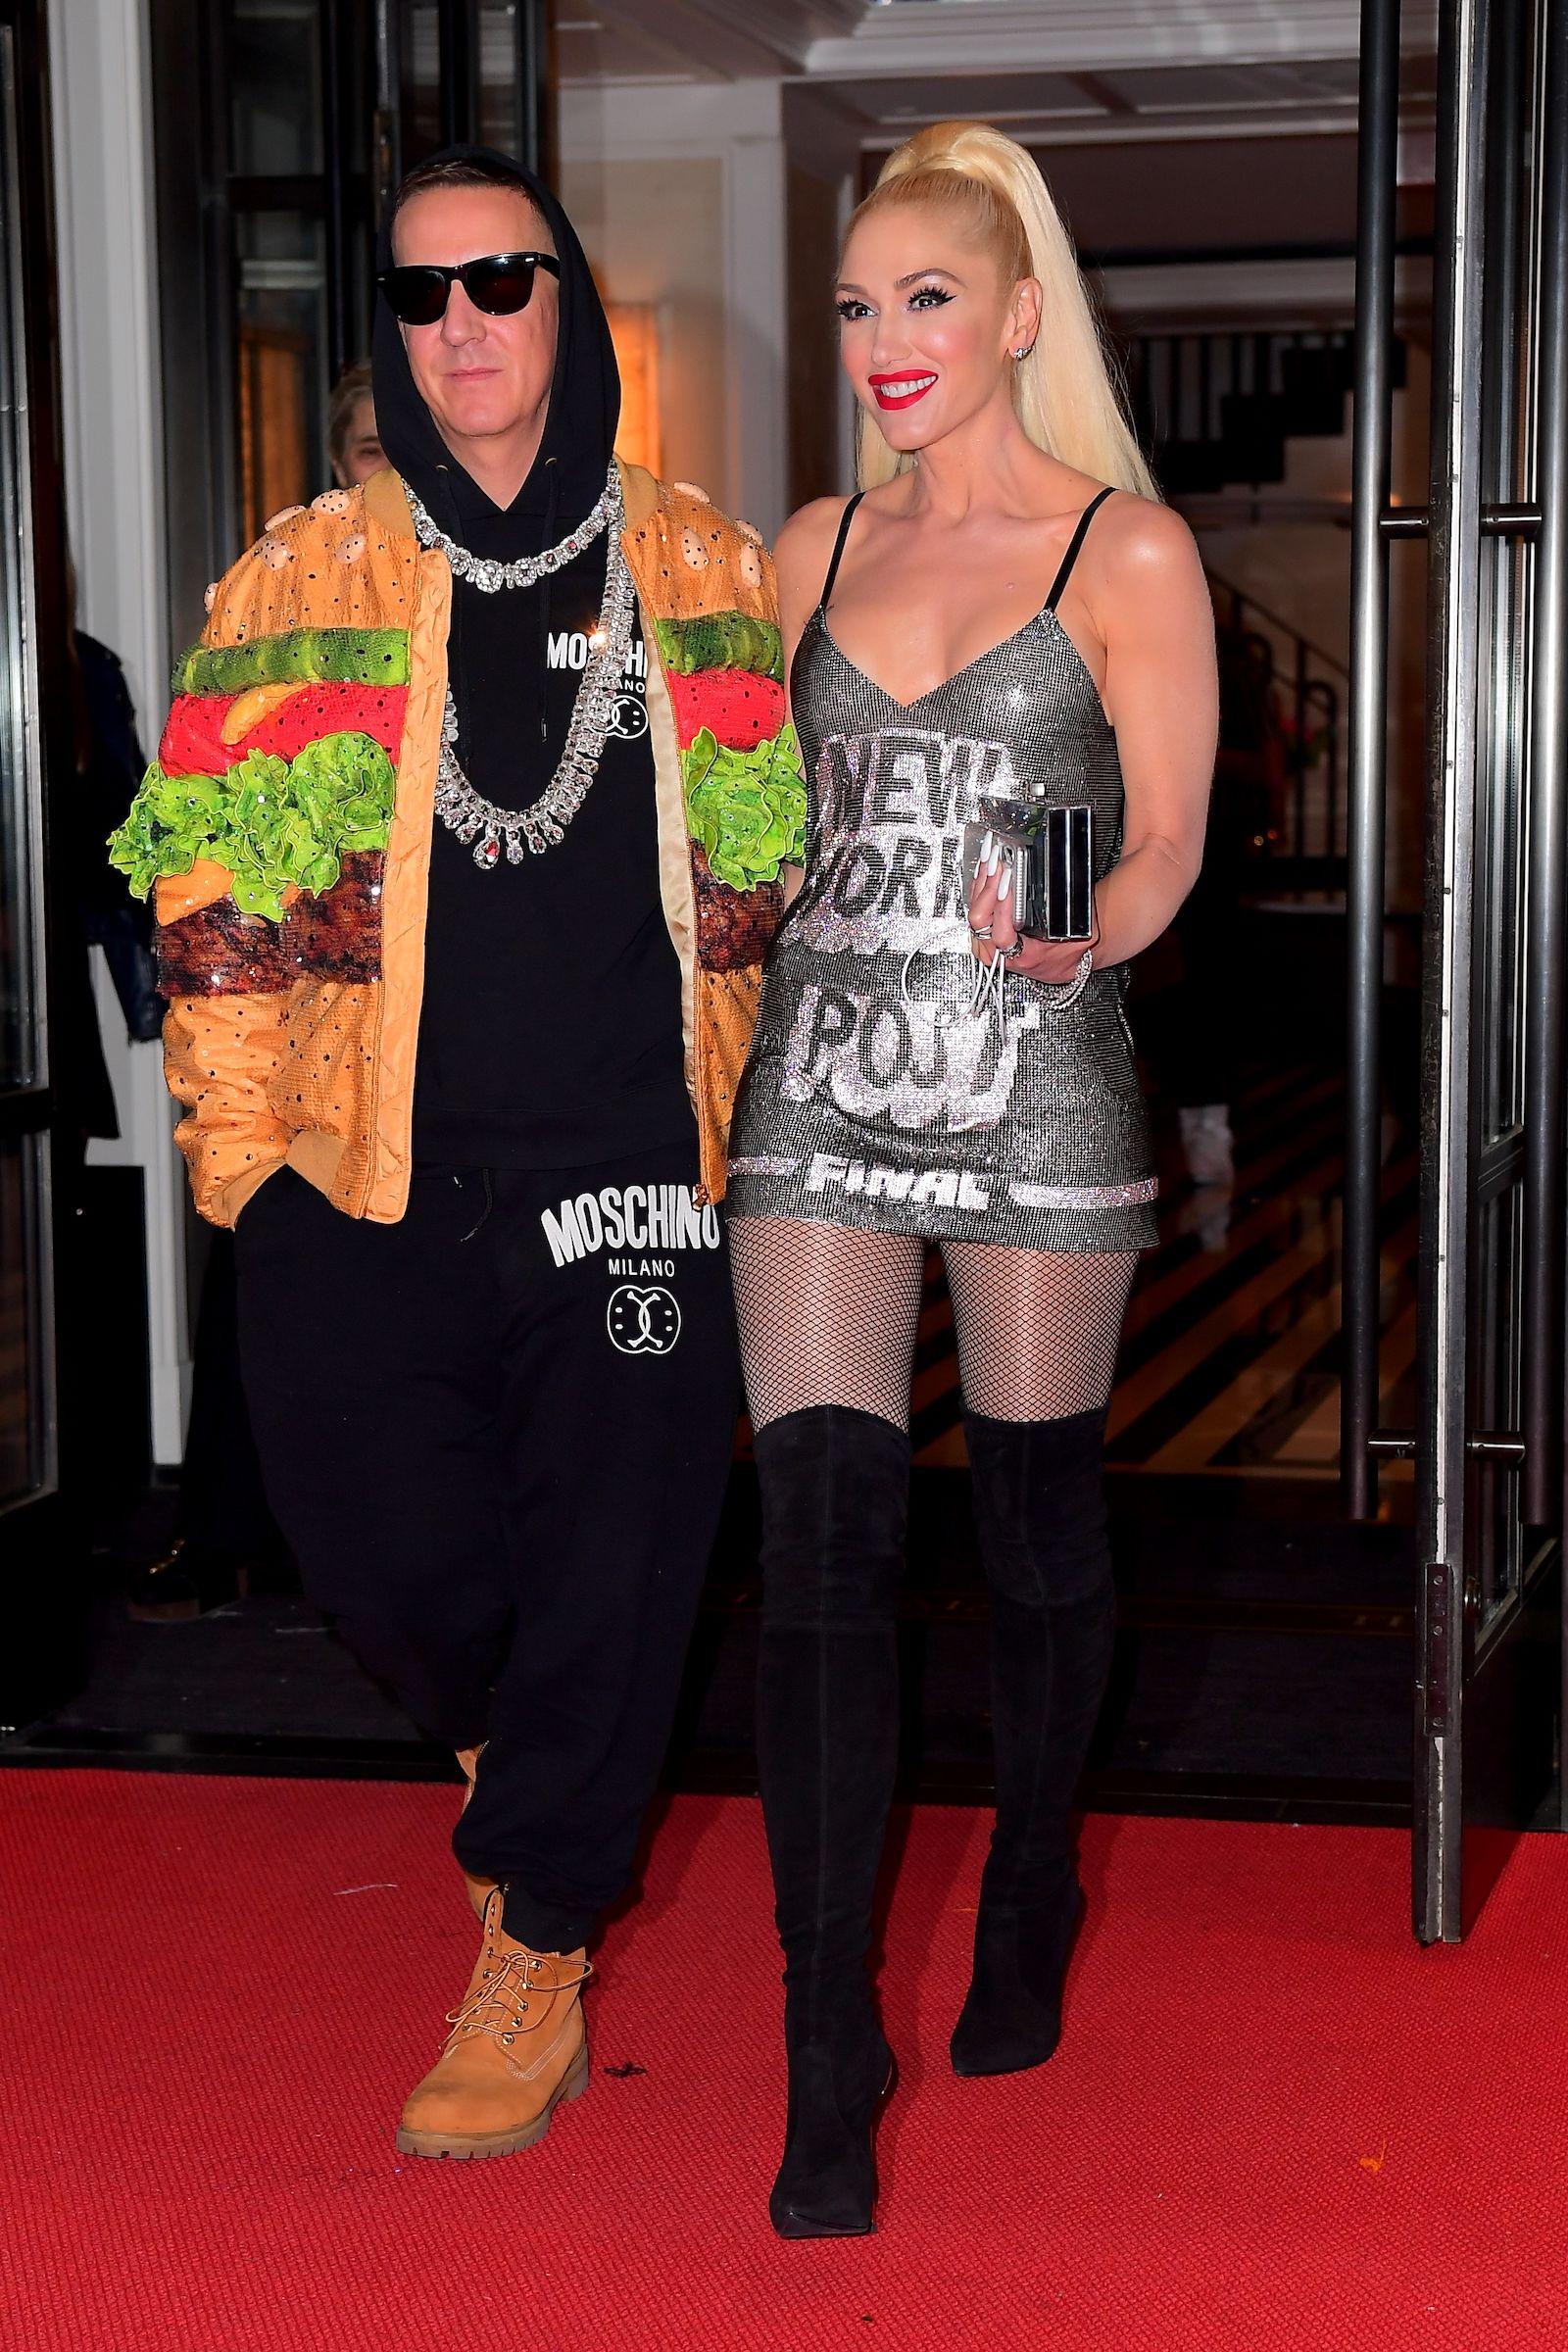 Gwen Stefani Headline in the news: Gwen Stefani Rocks Moschino.